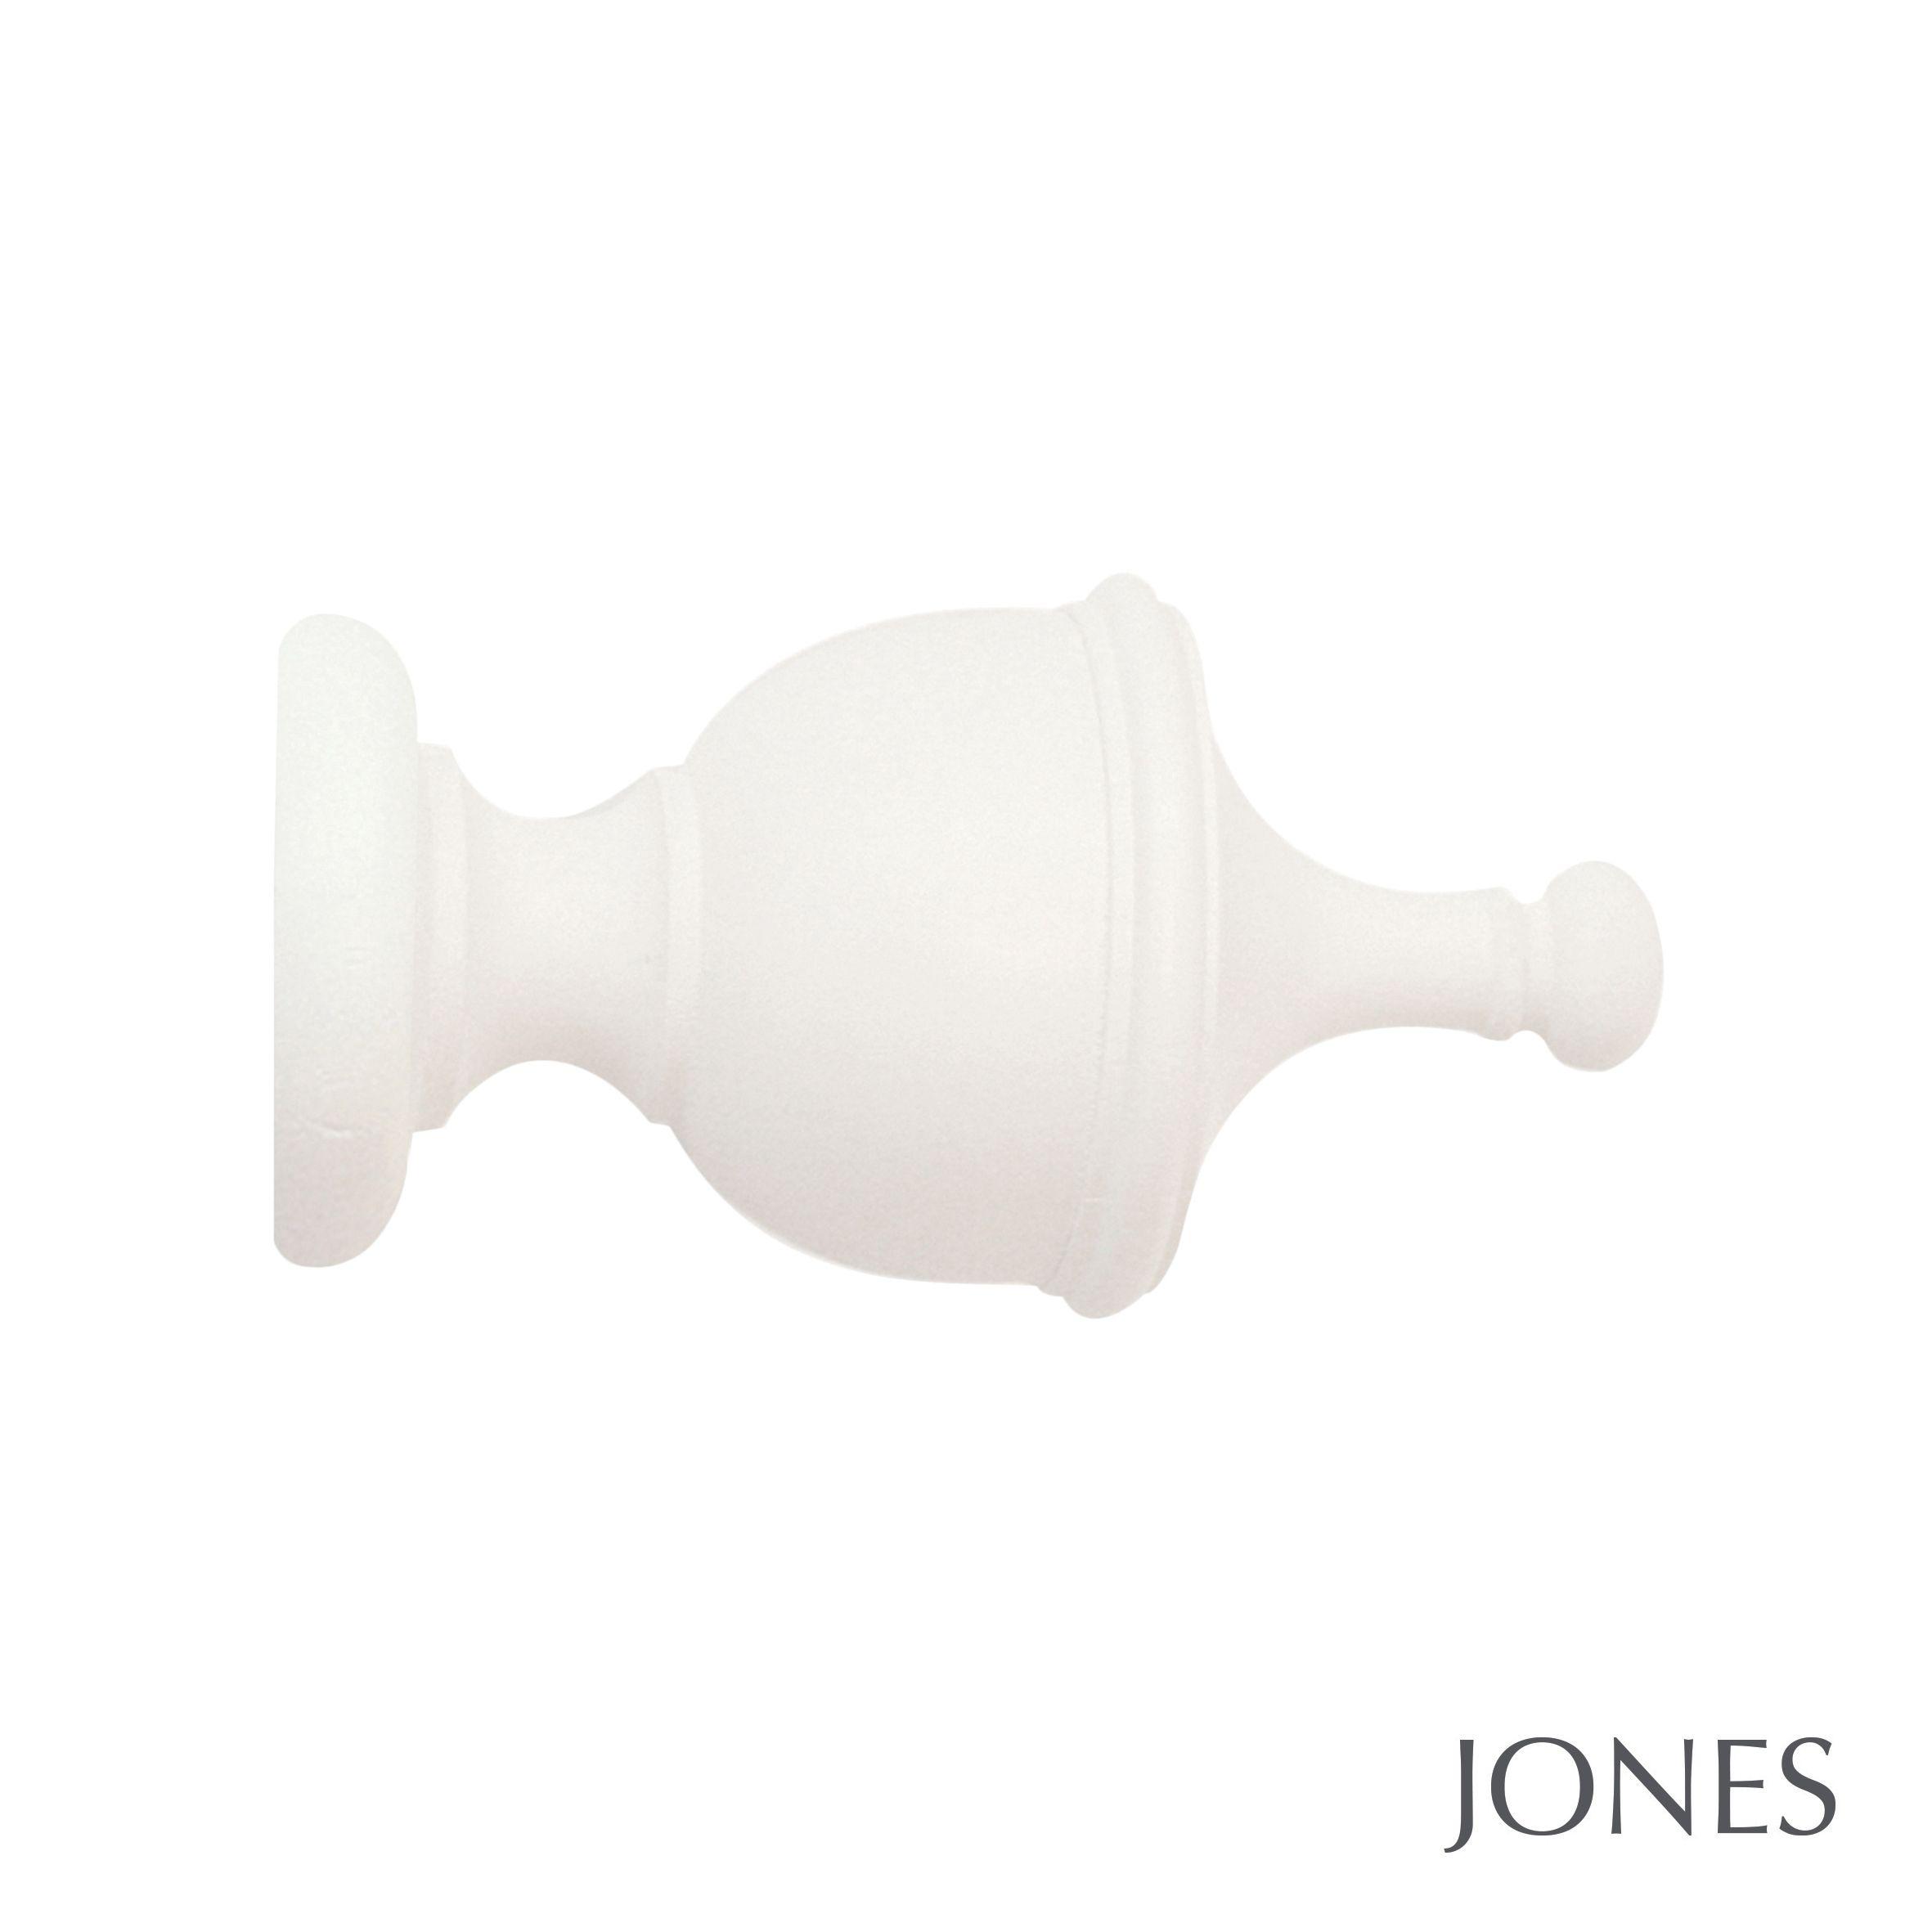 40mm Jones Urn Finial Cotton